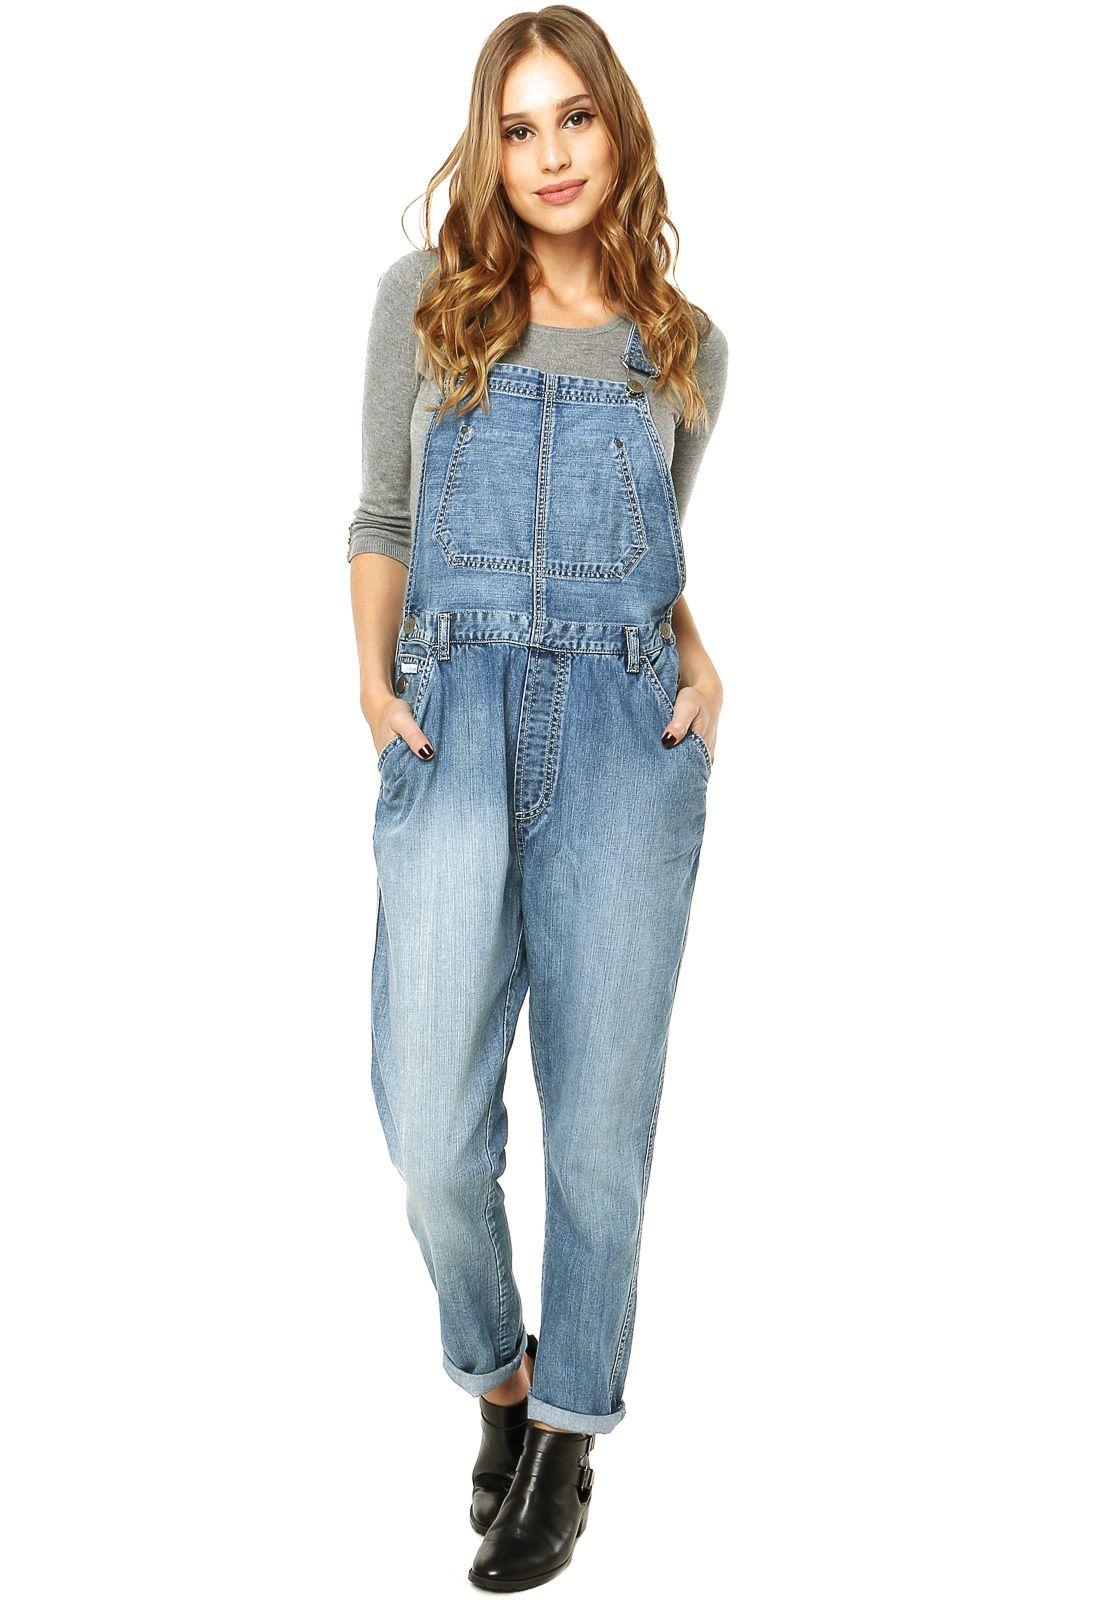 8cbb530c1 Macacão Jeans Calvin Klein Jeans Lottie Moss Azul - Compre Agora | Dafiti  Brasil